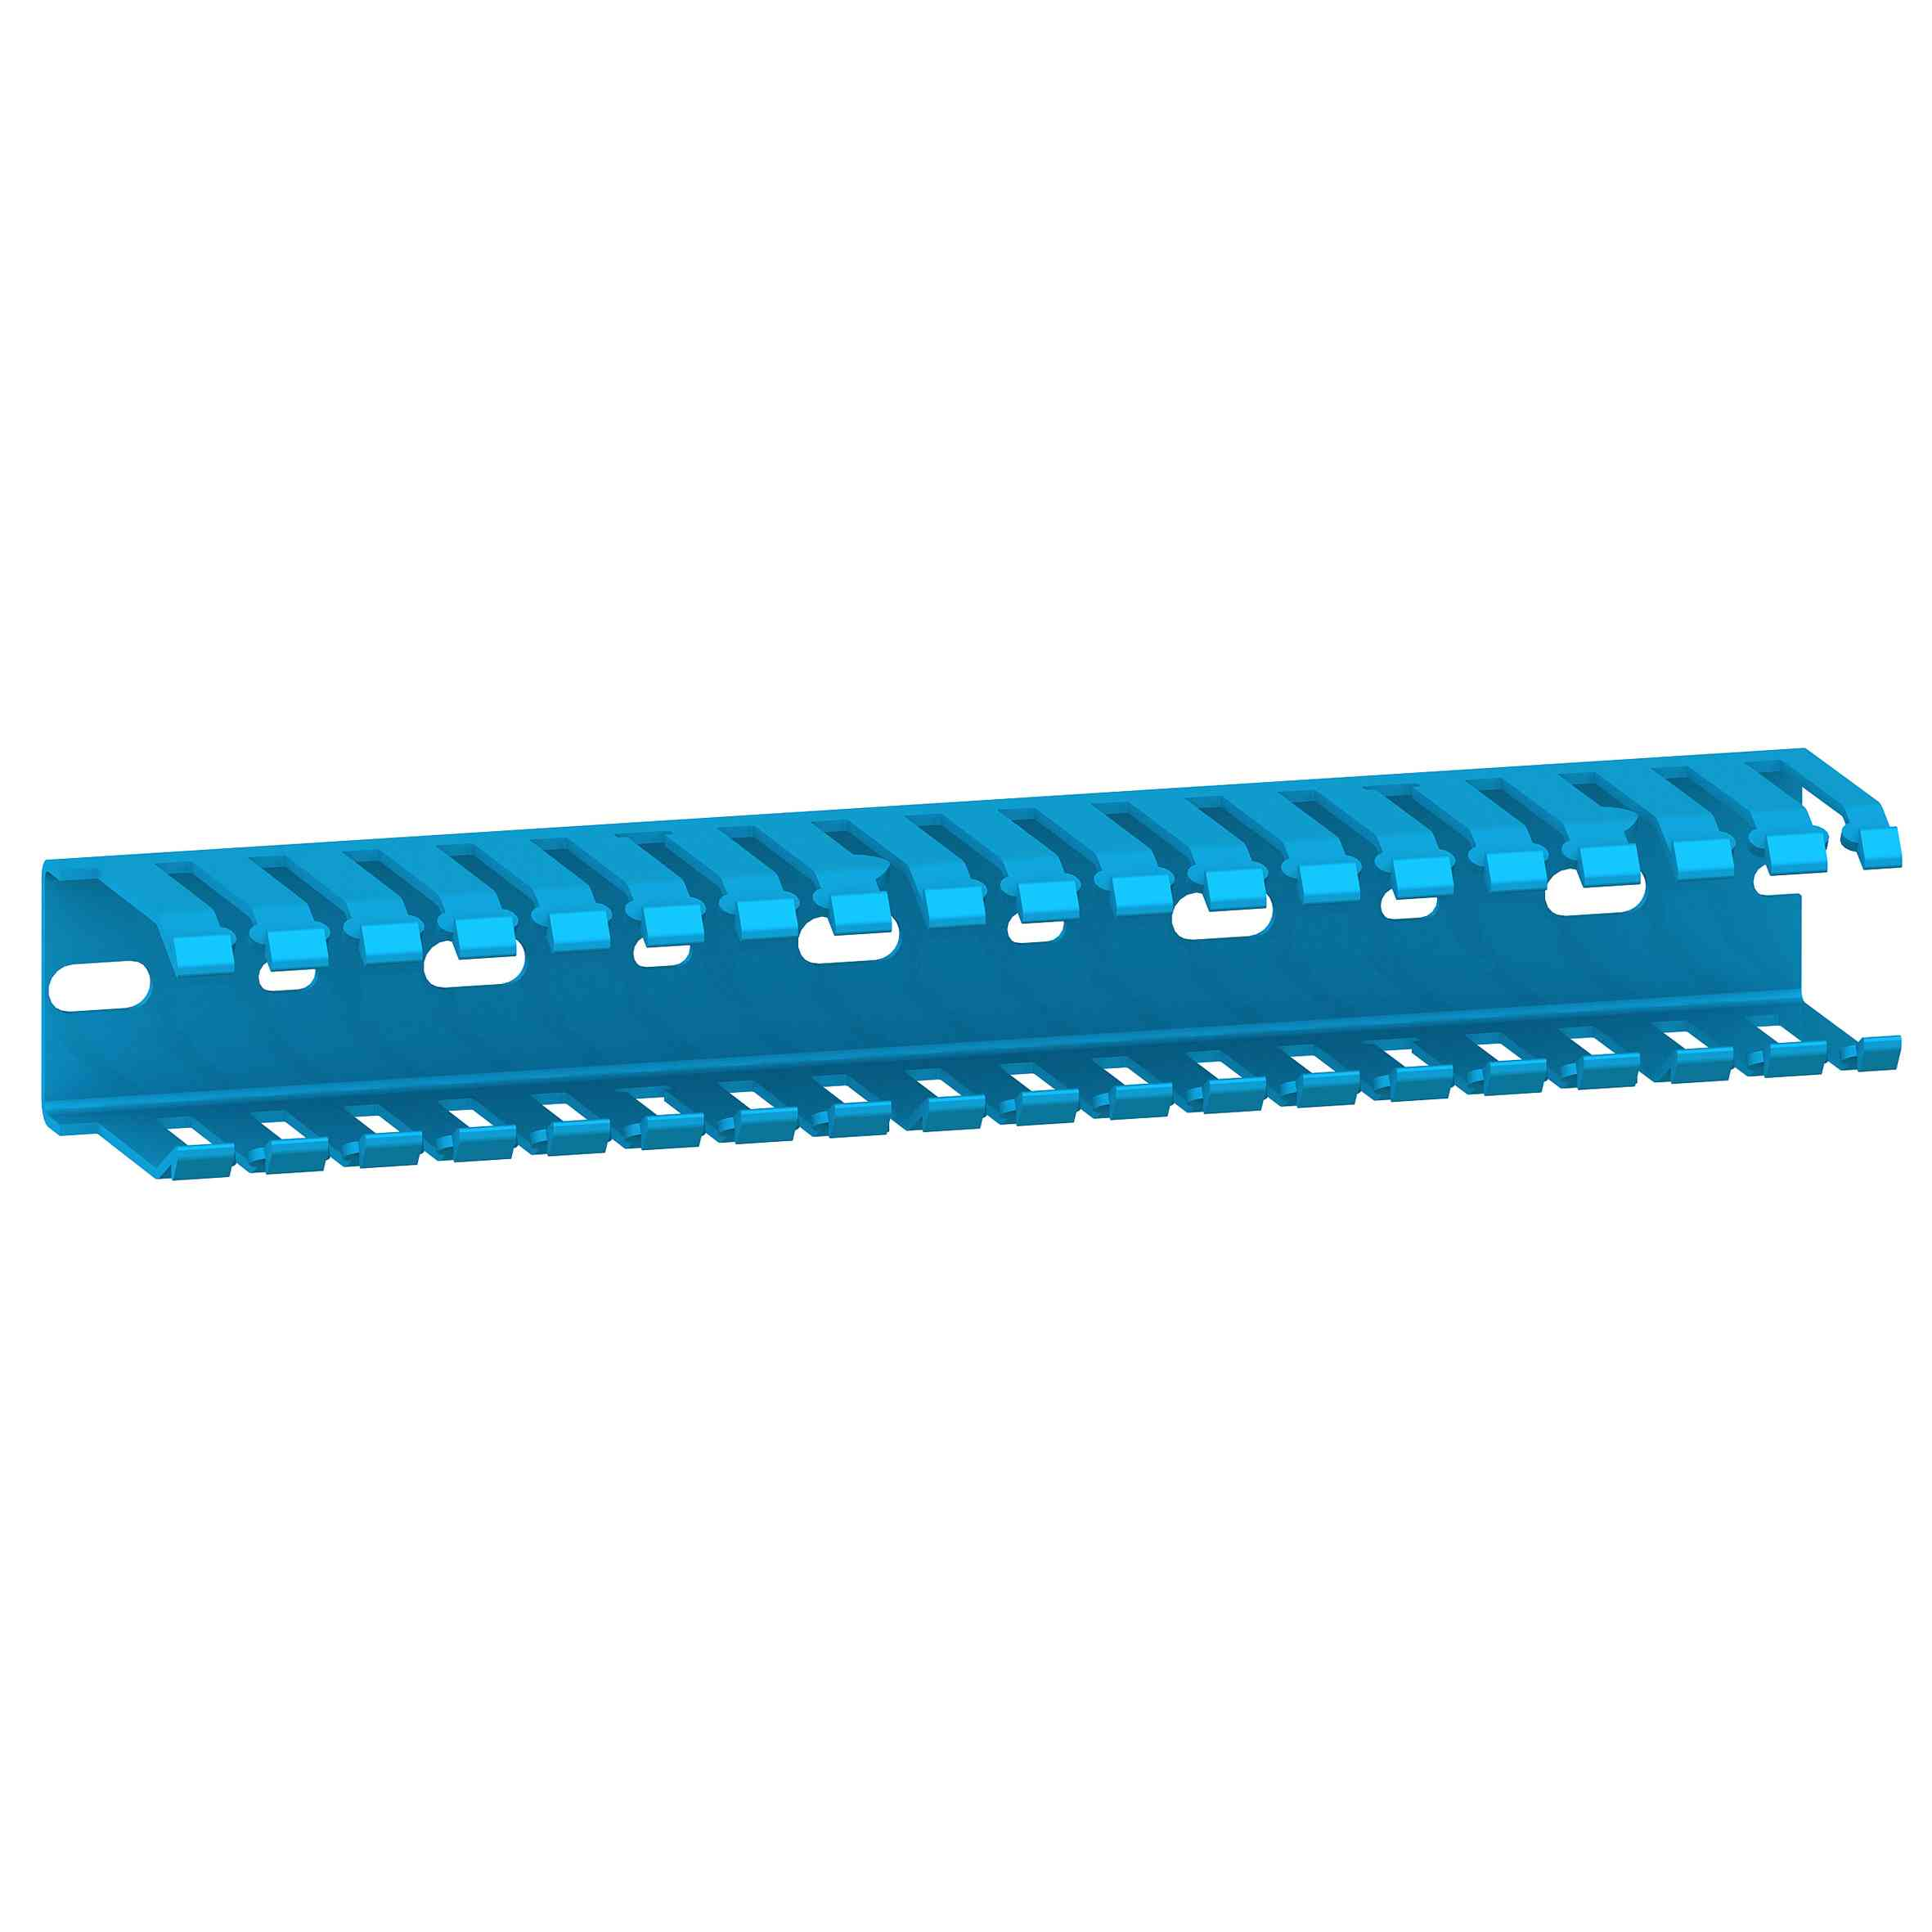 Kabelski kanal - 35 x 30 mm - brez pokrova - moder